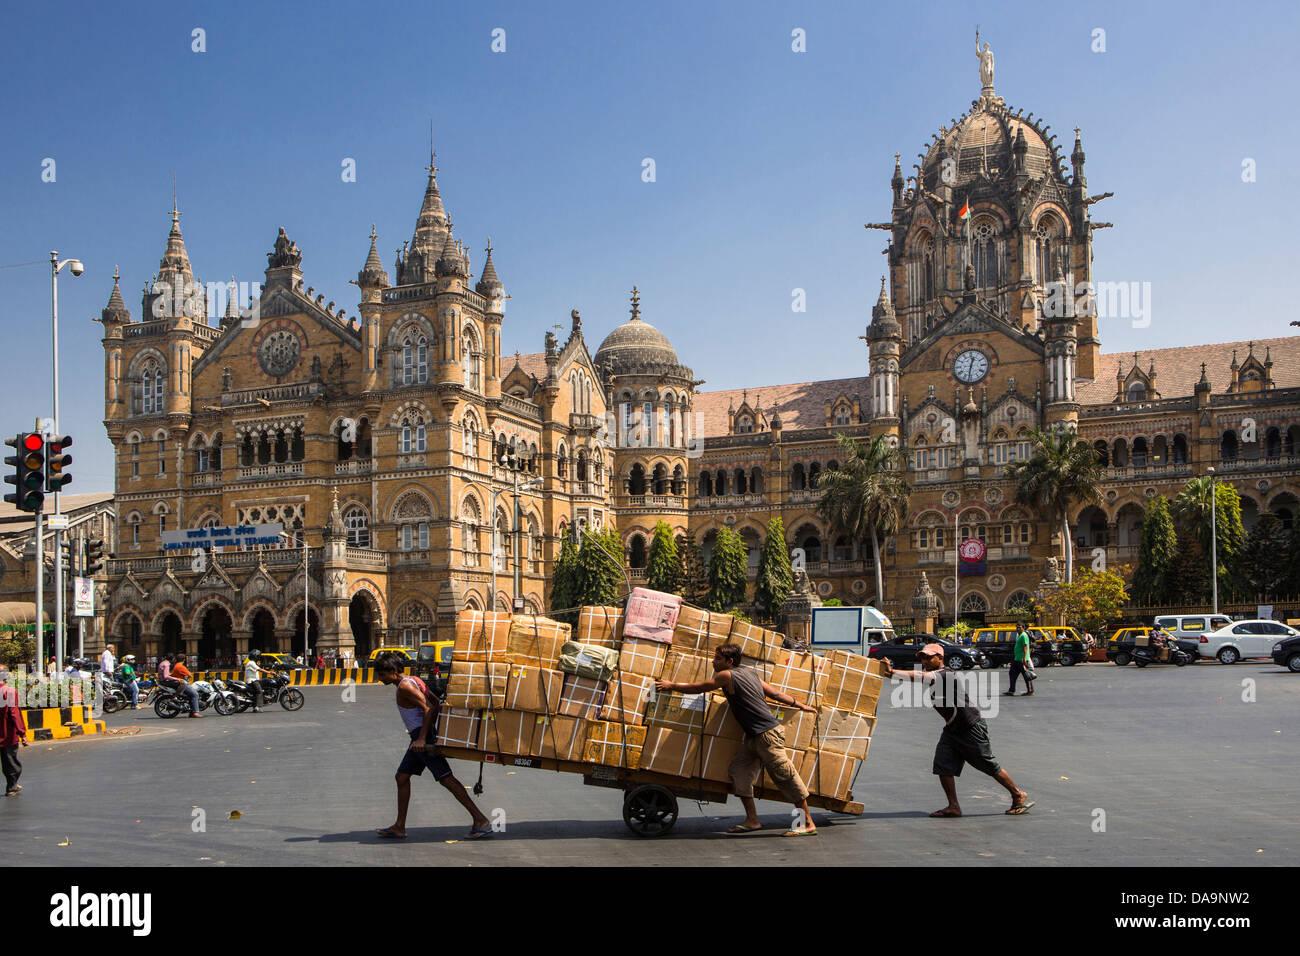 L'Inde, l'Inde, Asie, Maharashtra, Mumbai, Bombay, Ville, Dadabhai Naoroji, Road, Victoria Station, Termi, Photo Stock